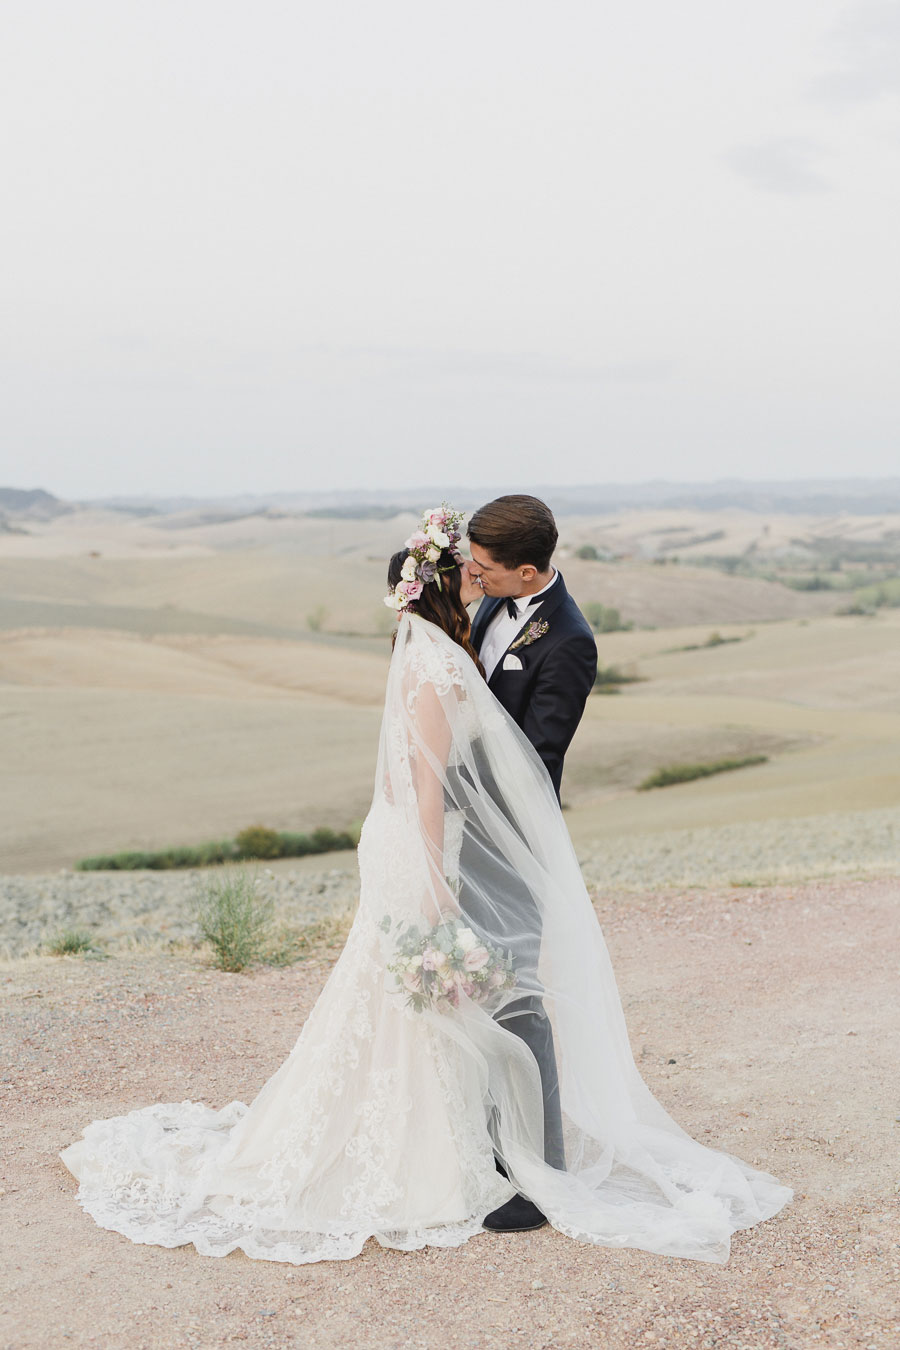 Wedding-Nicholad-and-Federica-Giuseppe-Giovannelli-166